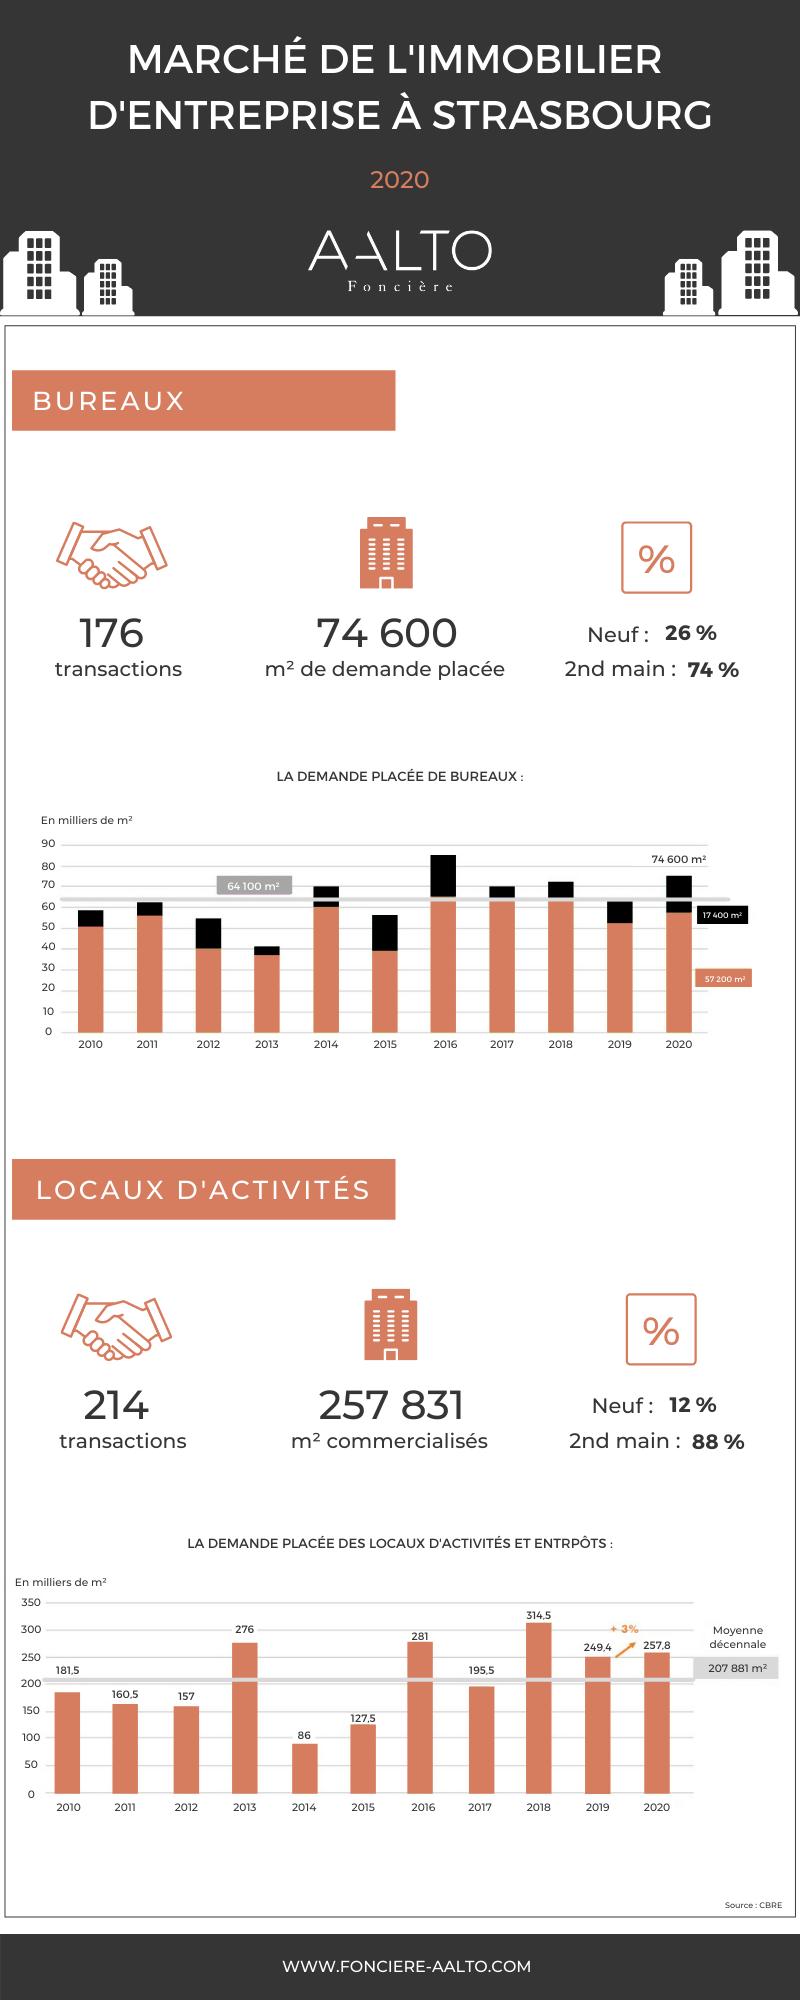 Investir En Immobilier D'entreprise Strasbourg